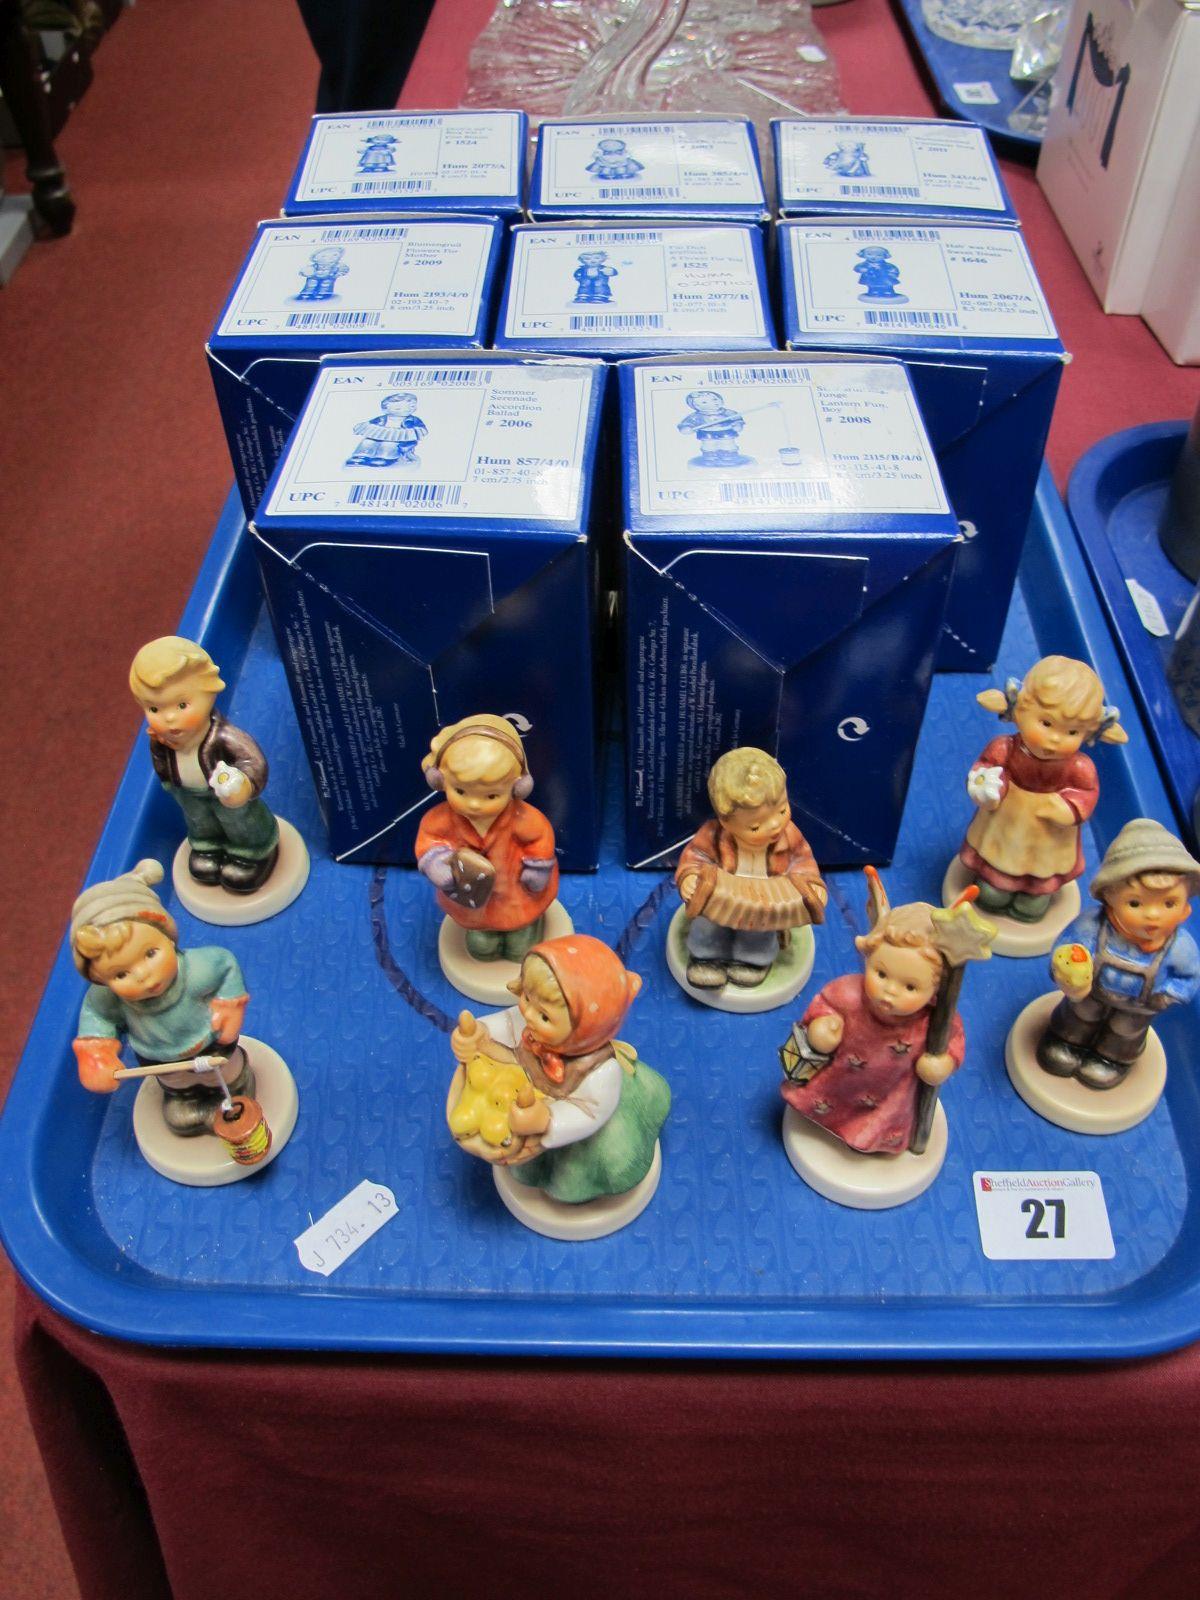 Lot 27 - Eight Boxed M. J. Hummel/Goebel Figures, including Accordion Ballad, Lantern Fun Boy, Flowers for